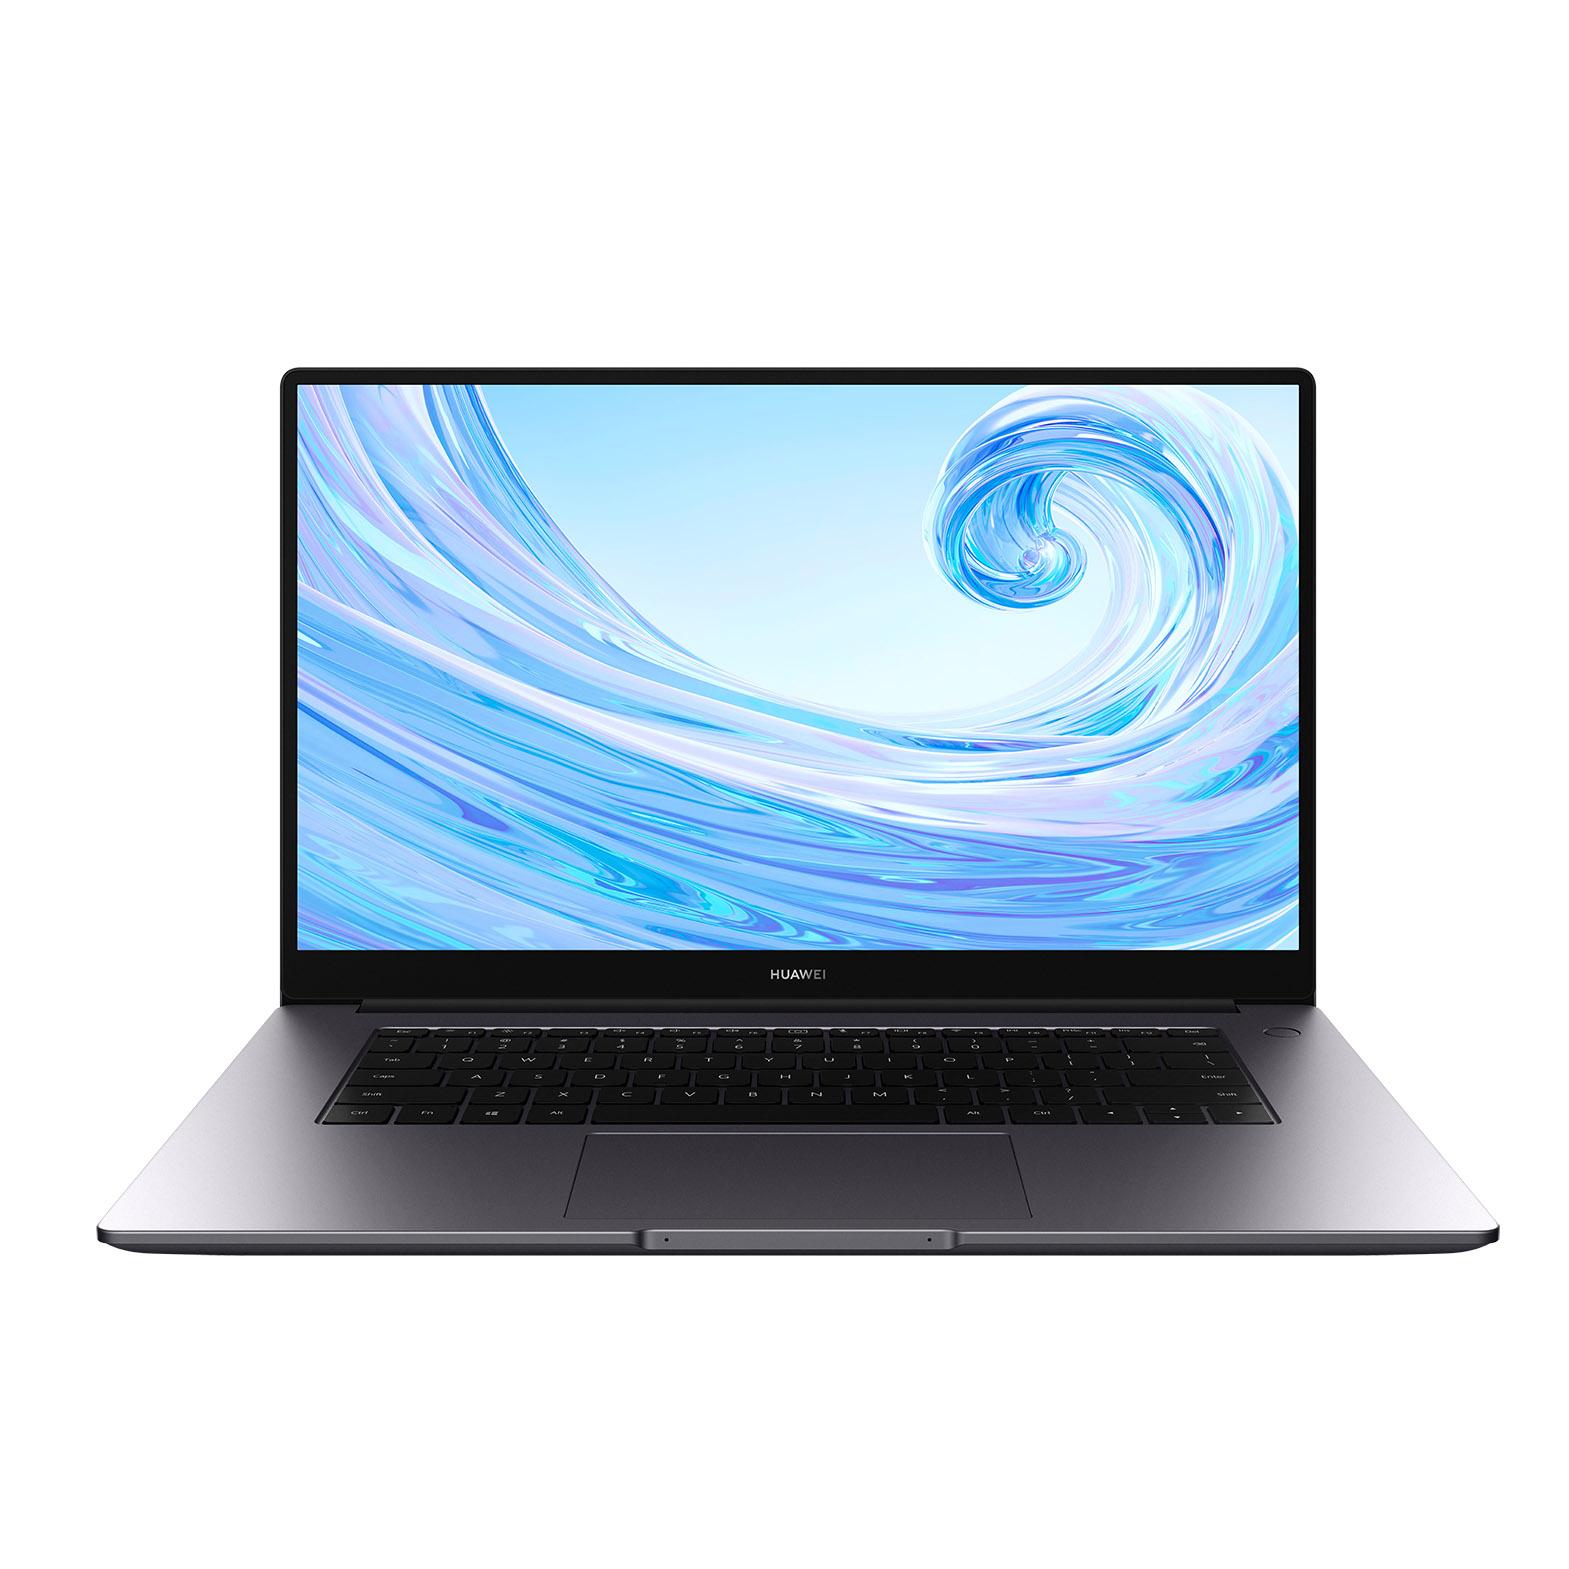 لپ تاپ 15.6 اینچی هوآوی مدل MateBook D15 BohrB